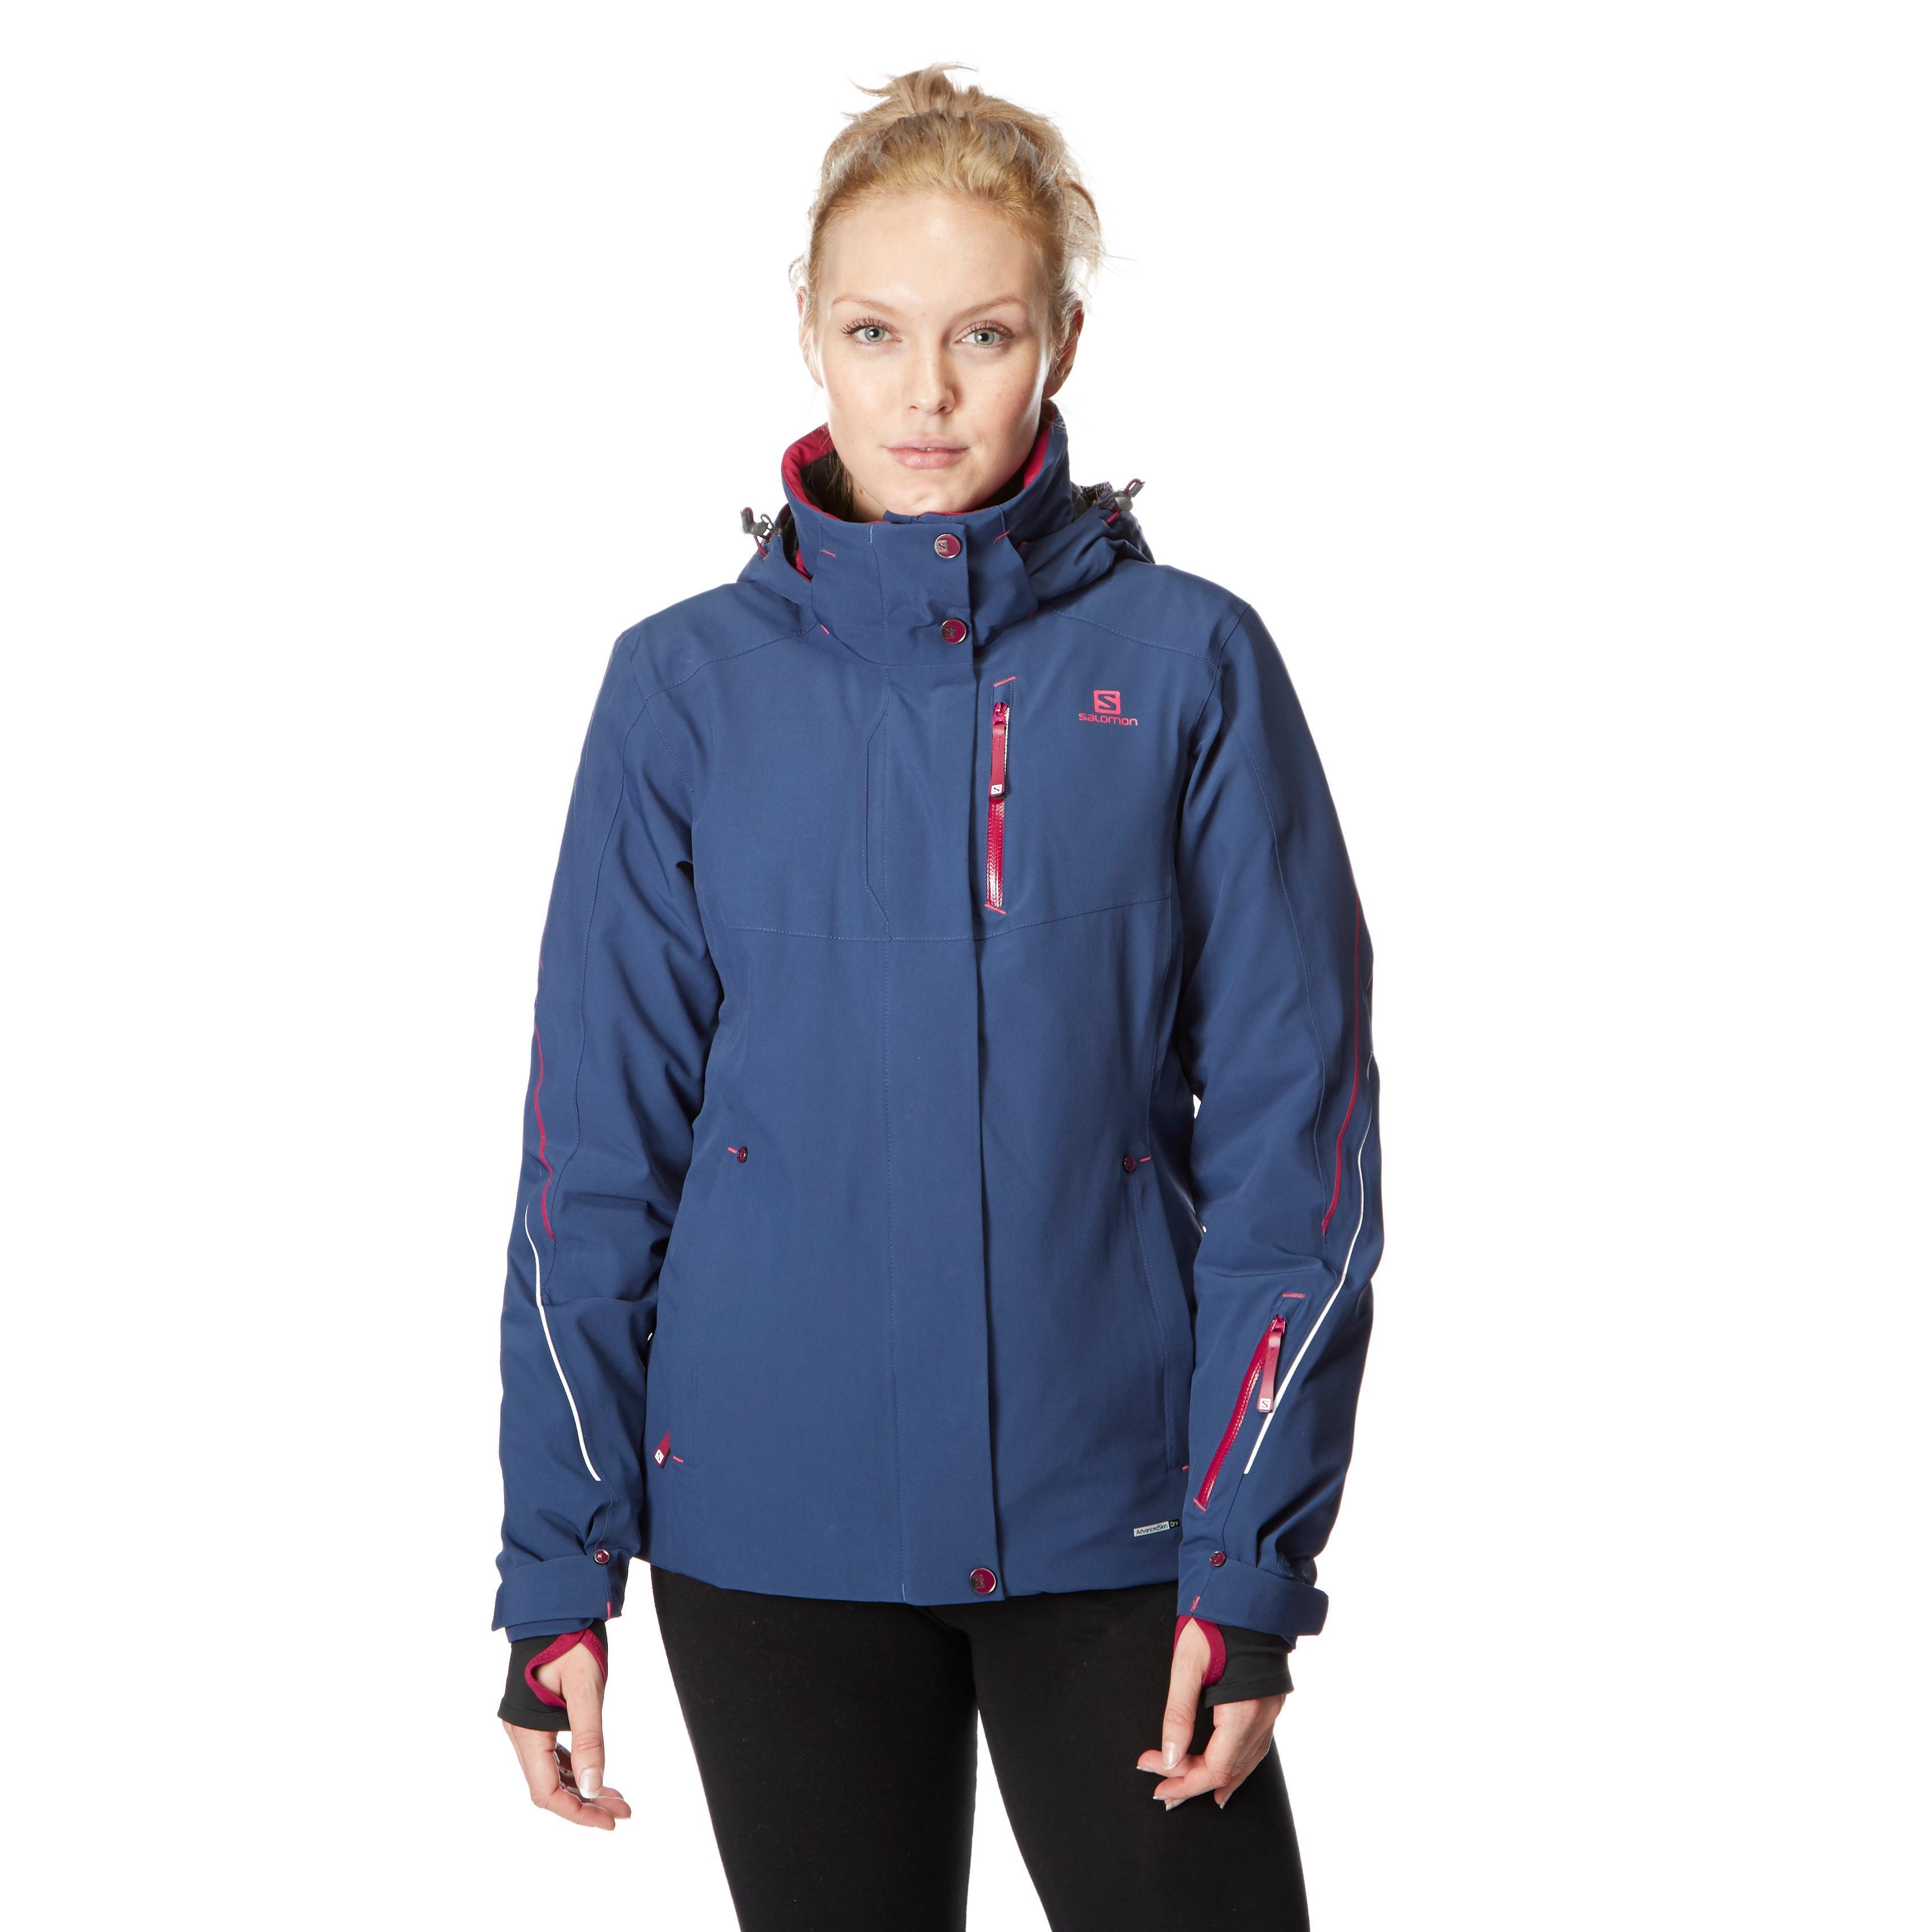 Salomon ski jacket women